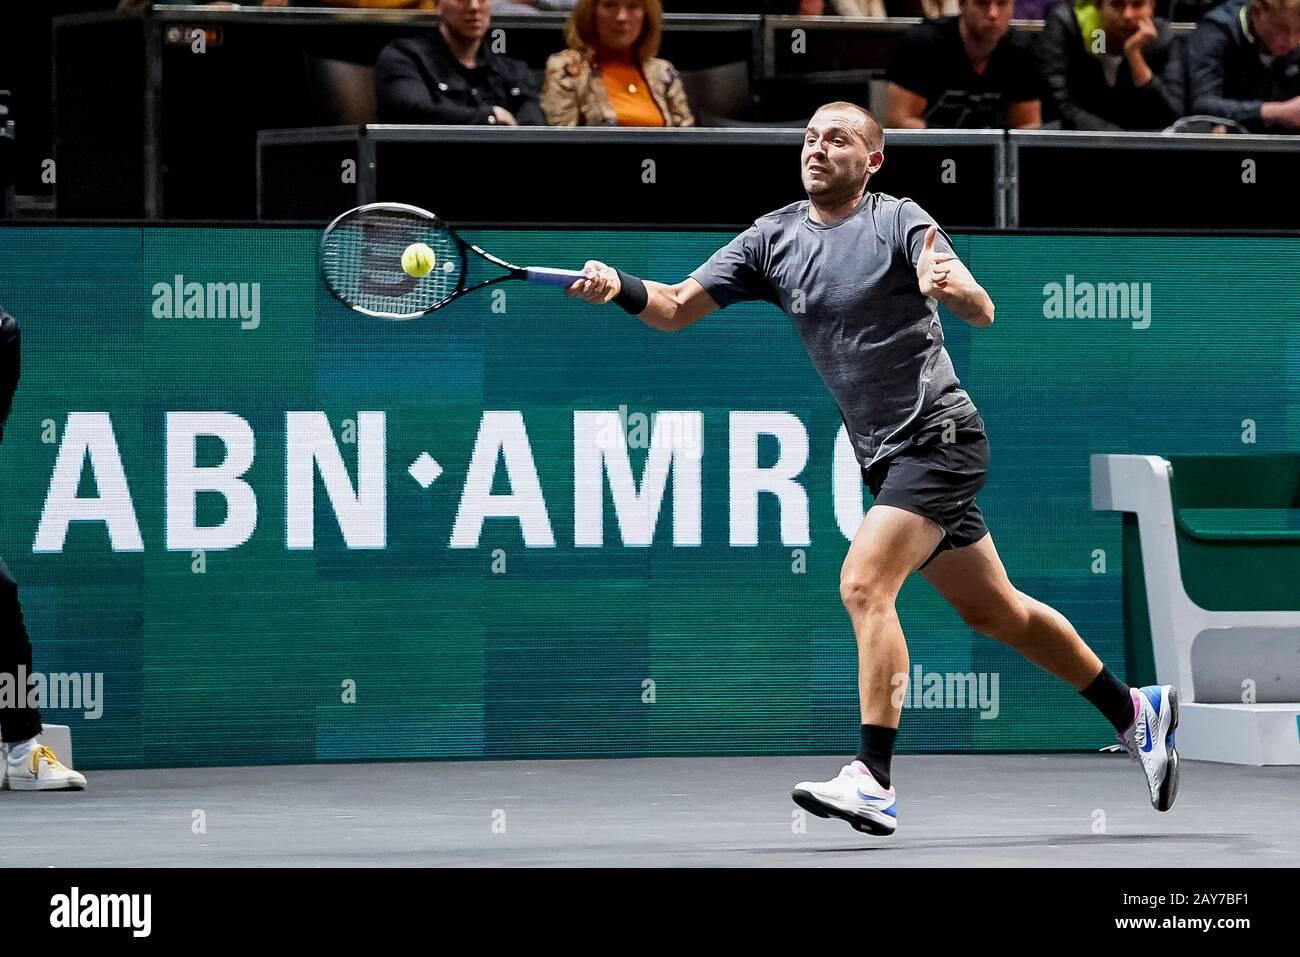 ROTTERDAM, ABN AMRO World Tennis Tournament, 14-02-2020, Ahoy Rotterdam,  Dan Evans (GBR) Credit: Pro Shots/Alamy Live News Stock Photo - Alamy